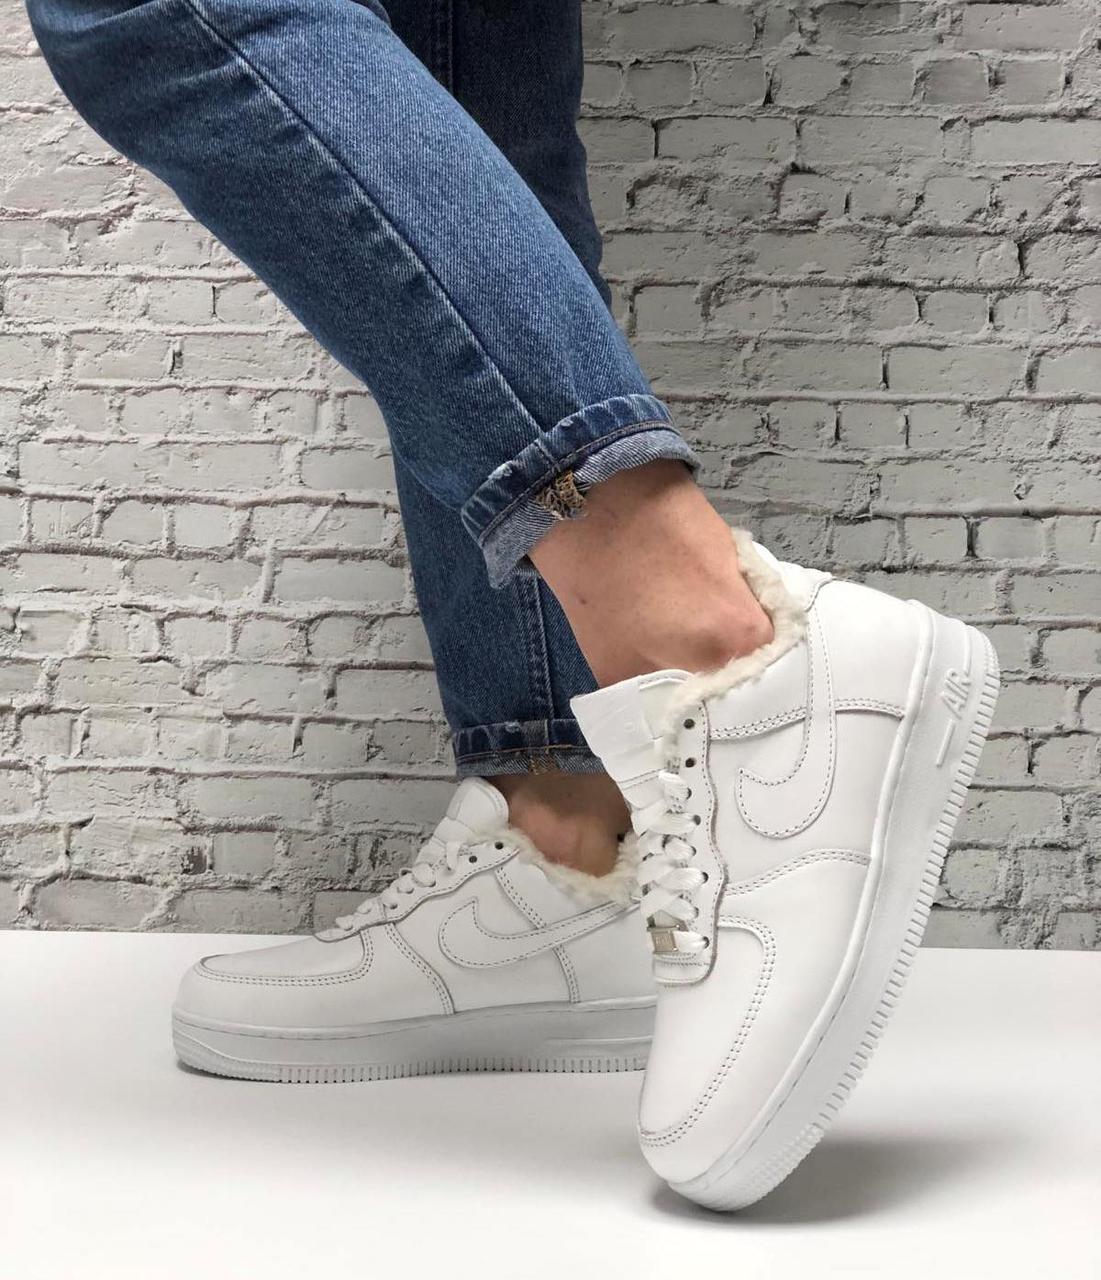 Кроссовки зимние Nike Air Force low full white (Реплика ААА)